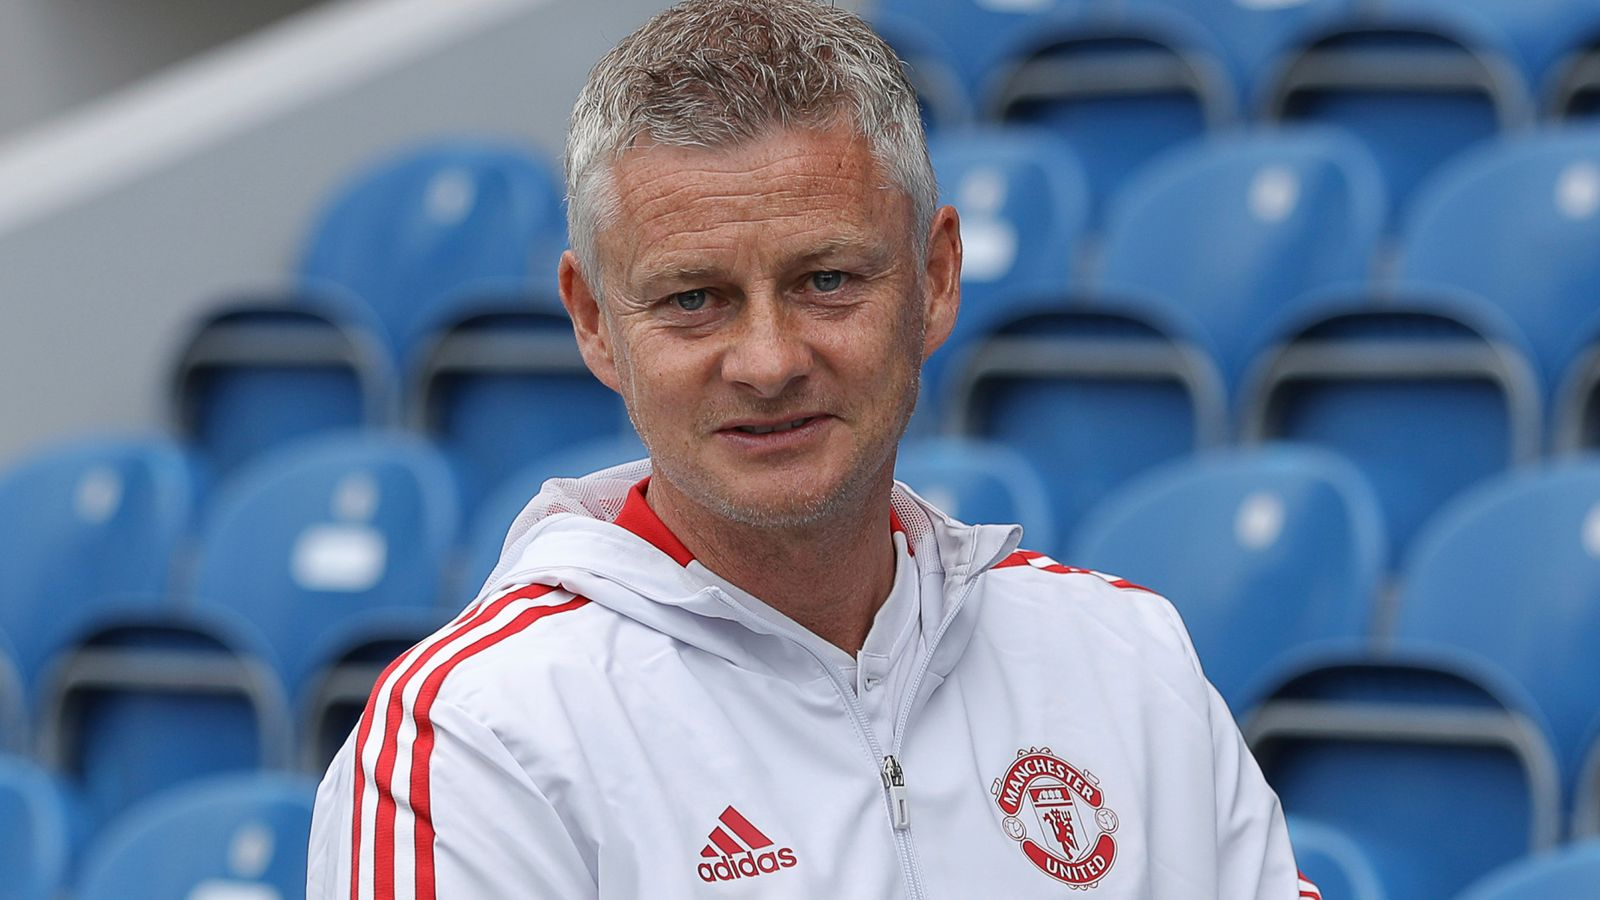 Manchester United transfer news: Ole Gunnar Solskjaer says more signings a 'bonus', gives Paul Pogba update - Bóng Đá